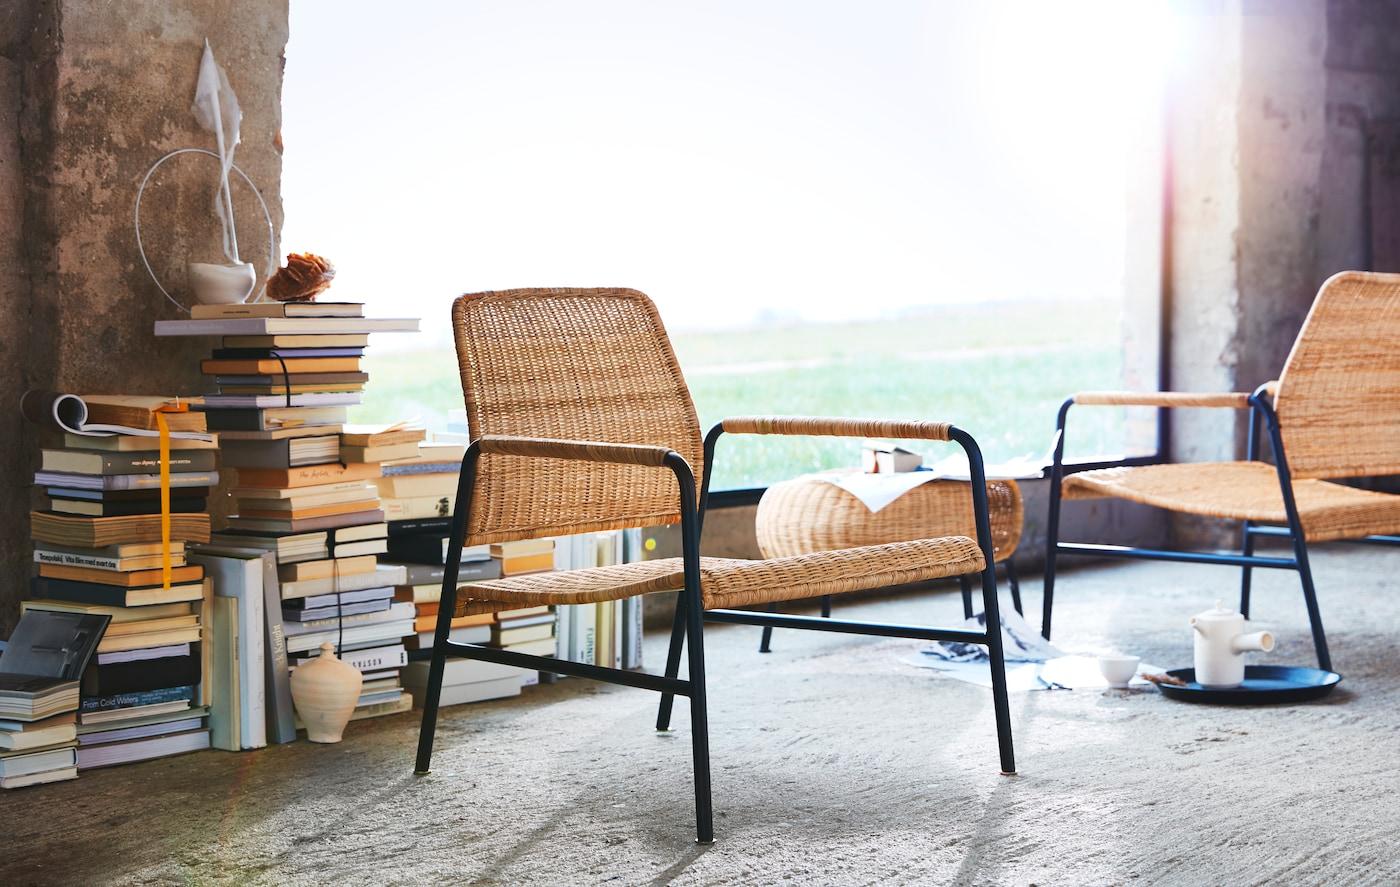 sillas de ratán de IKEA